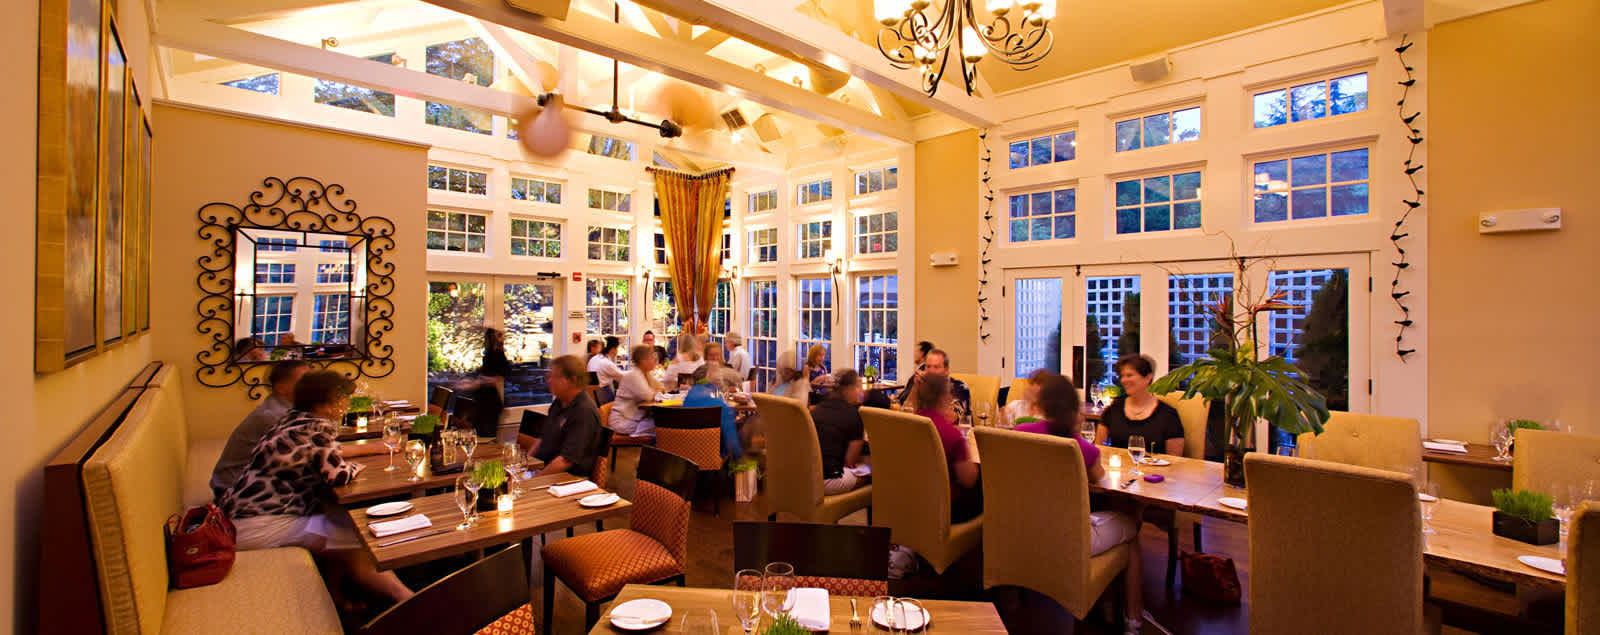 Fairfax restaurants